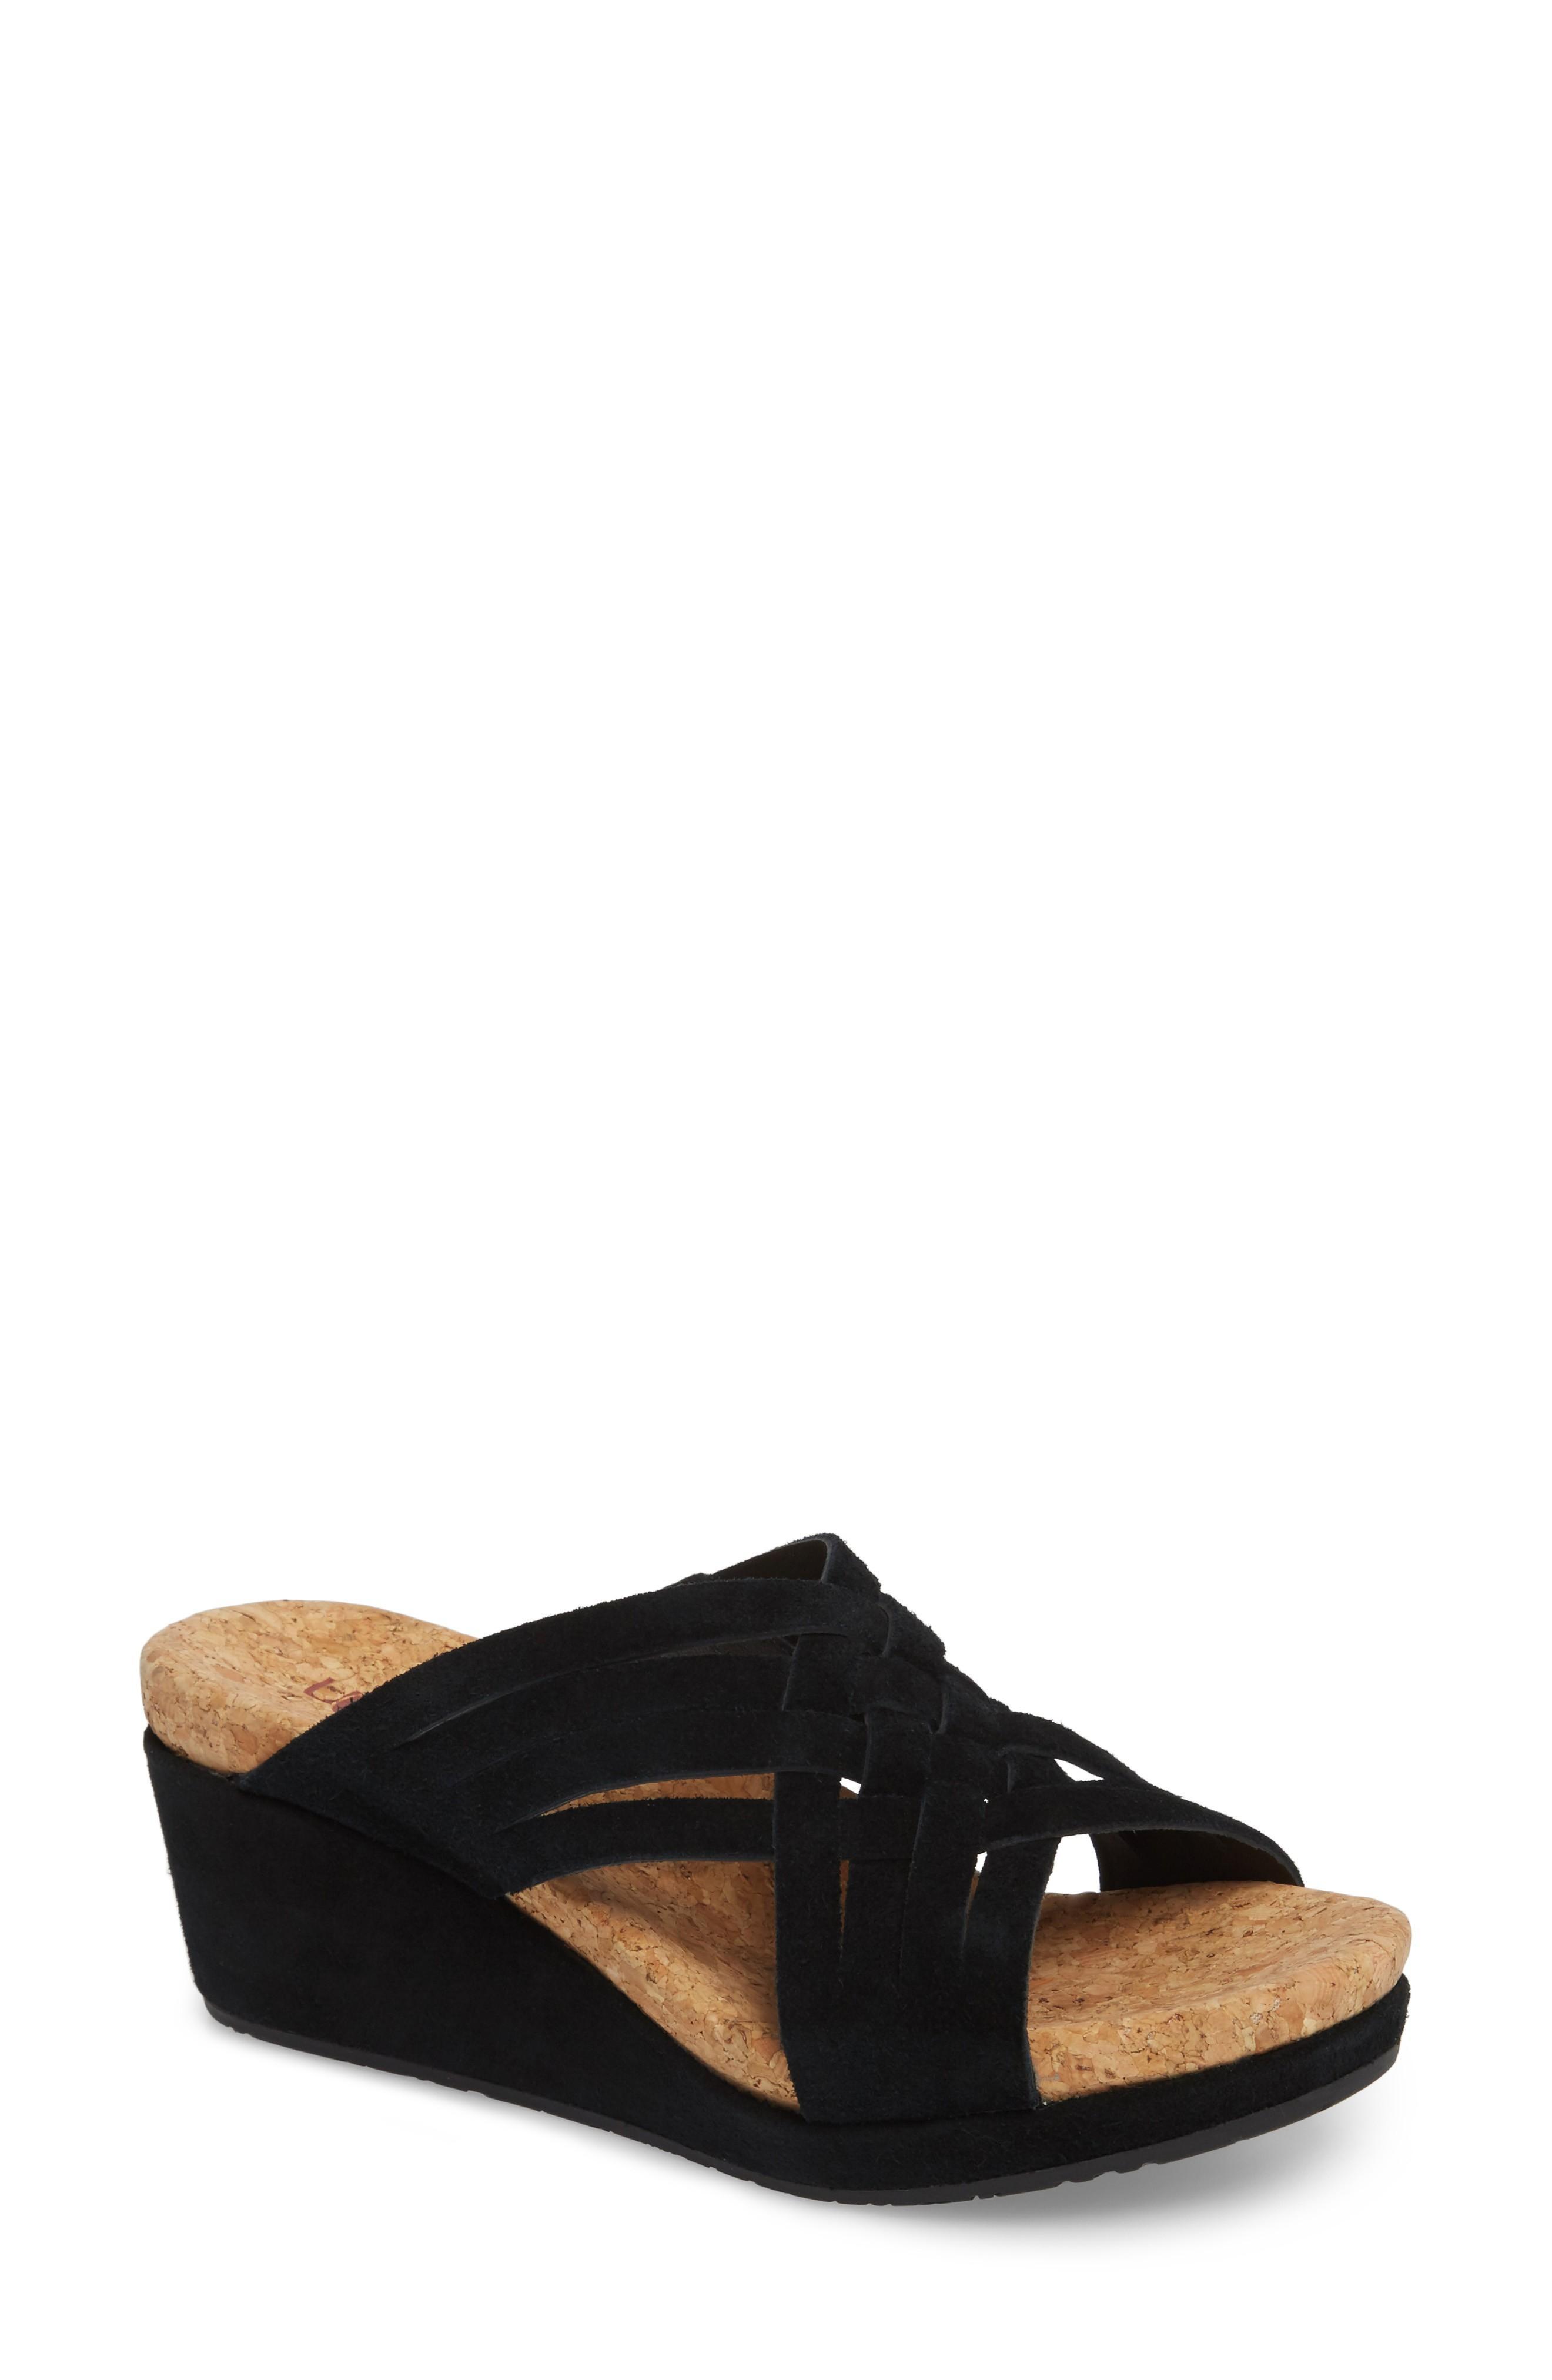 c2cc38f64b Ugg Lilah Wedge Sandal In Black Suede   ModeSens